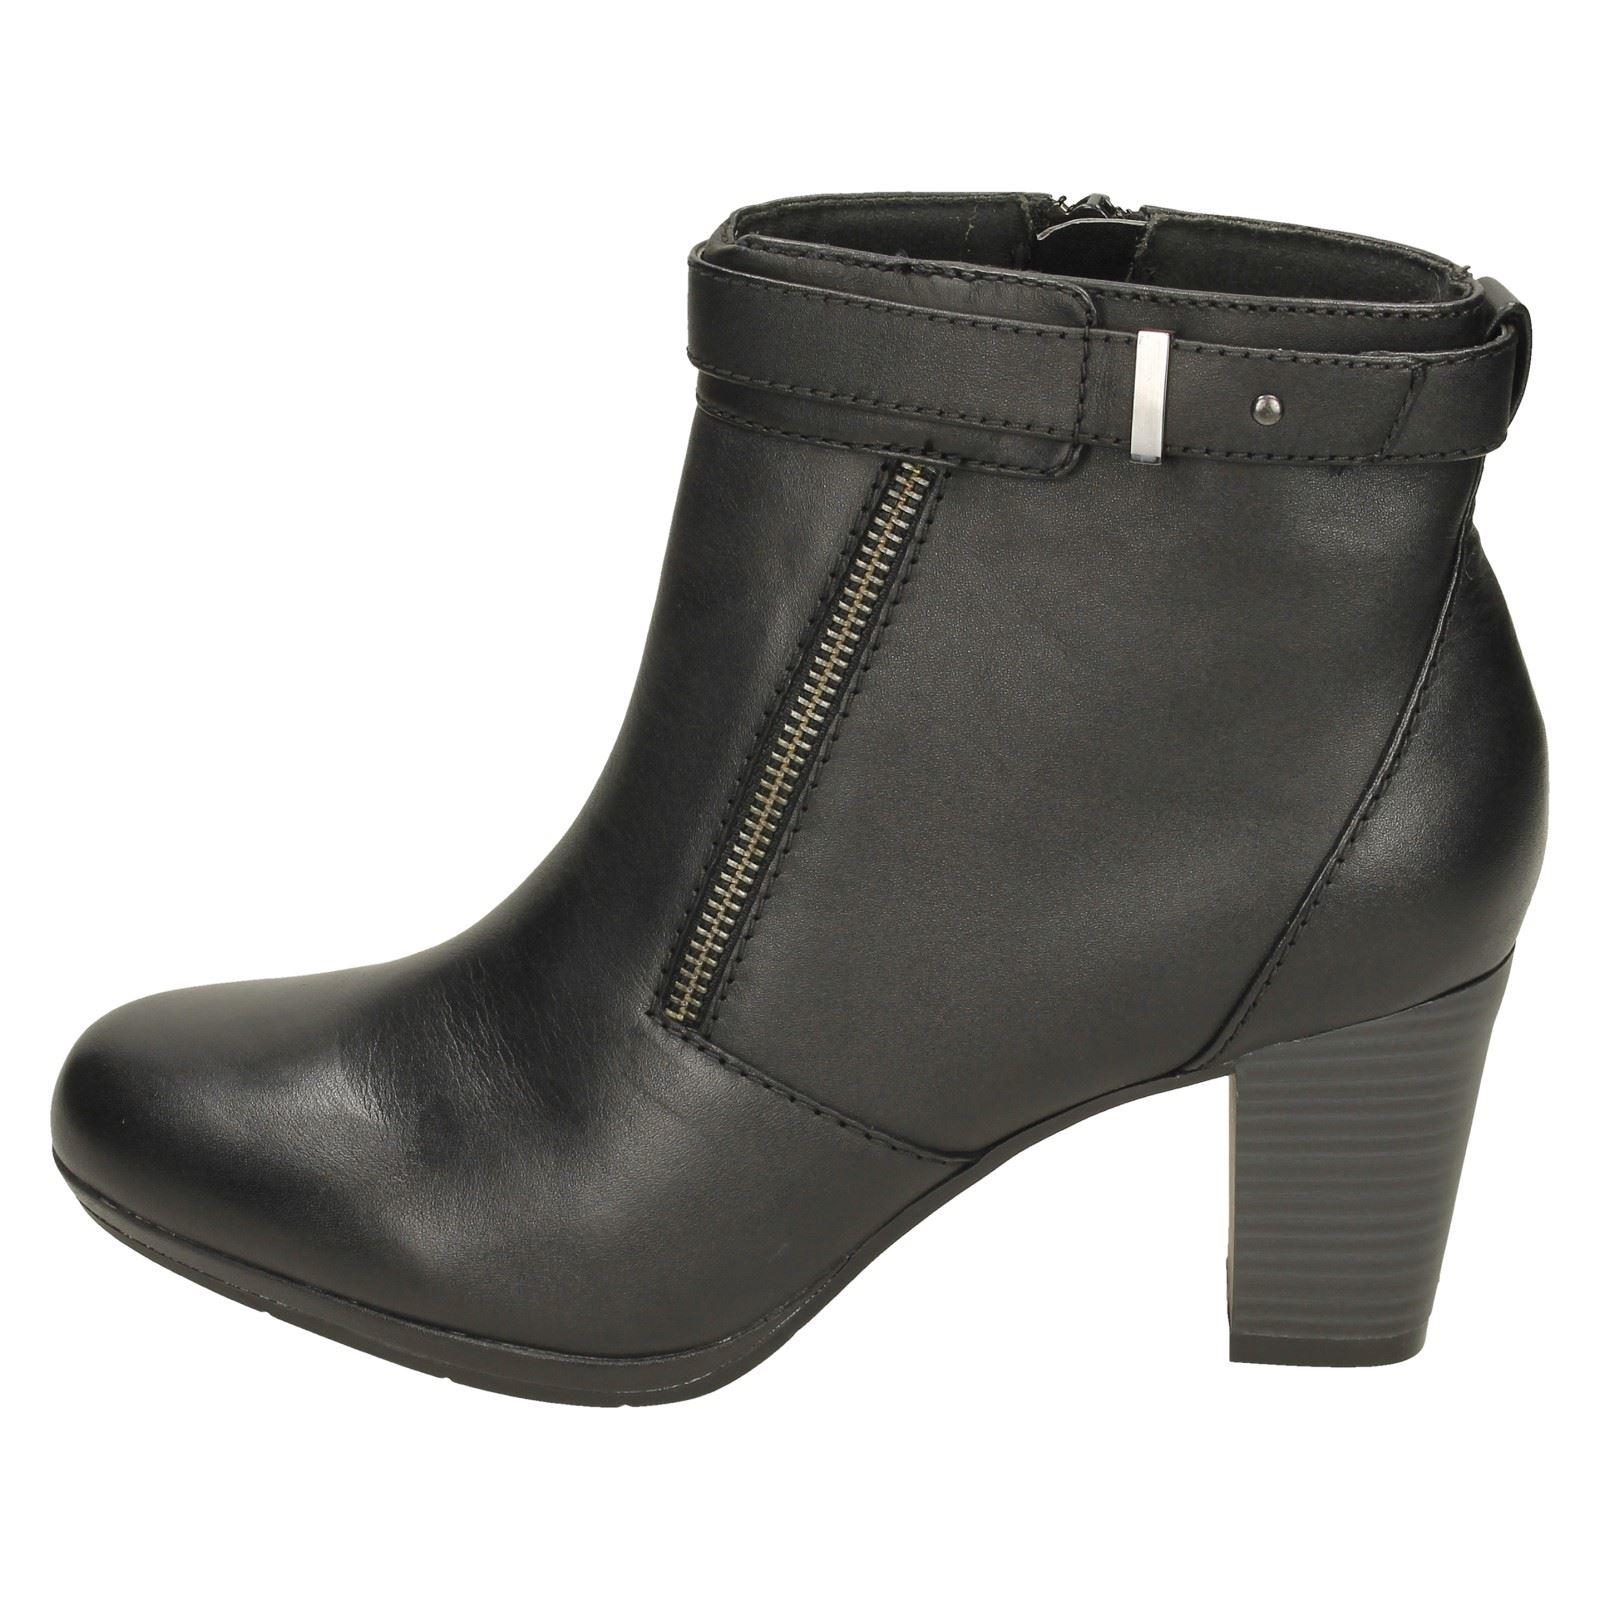 Casual Gillian Clarks Stivaletti Black con Ladies Kalea tacco 4FA16wR8q